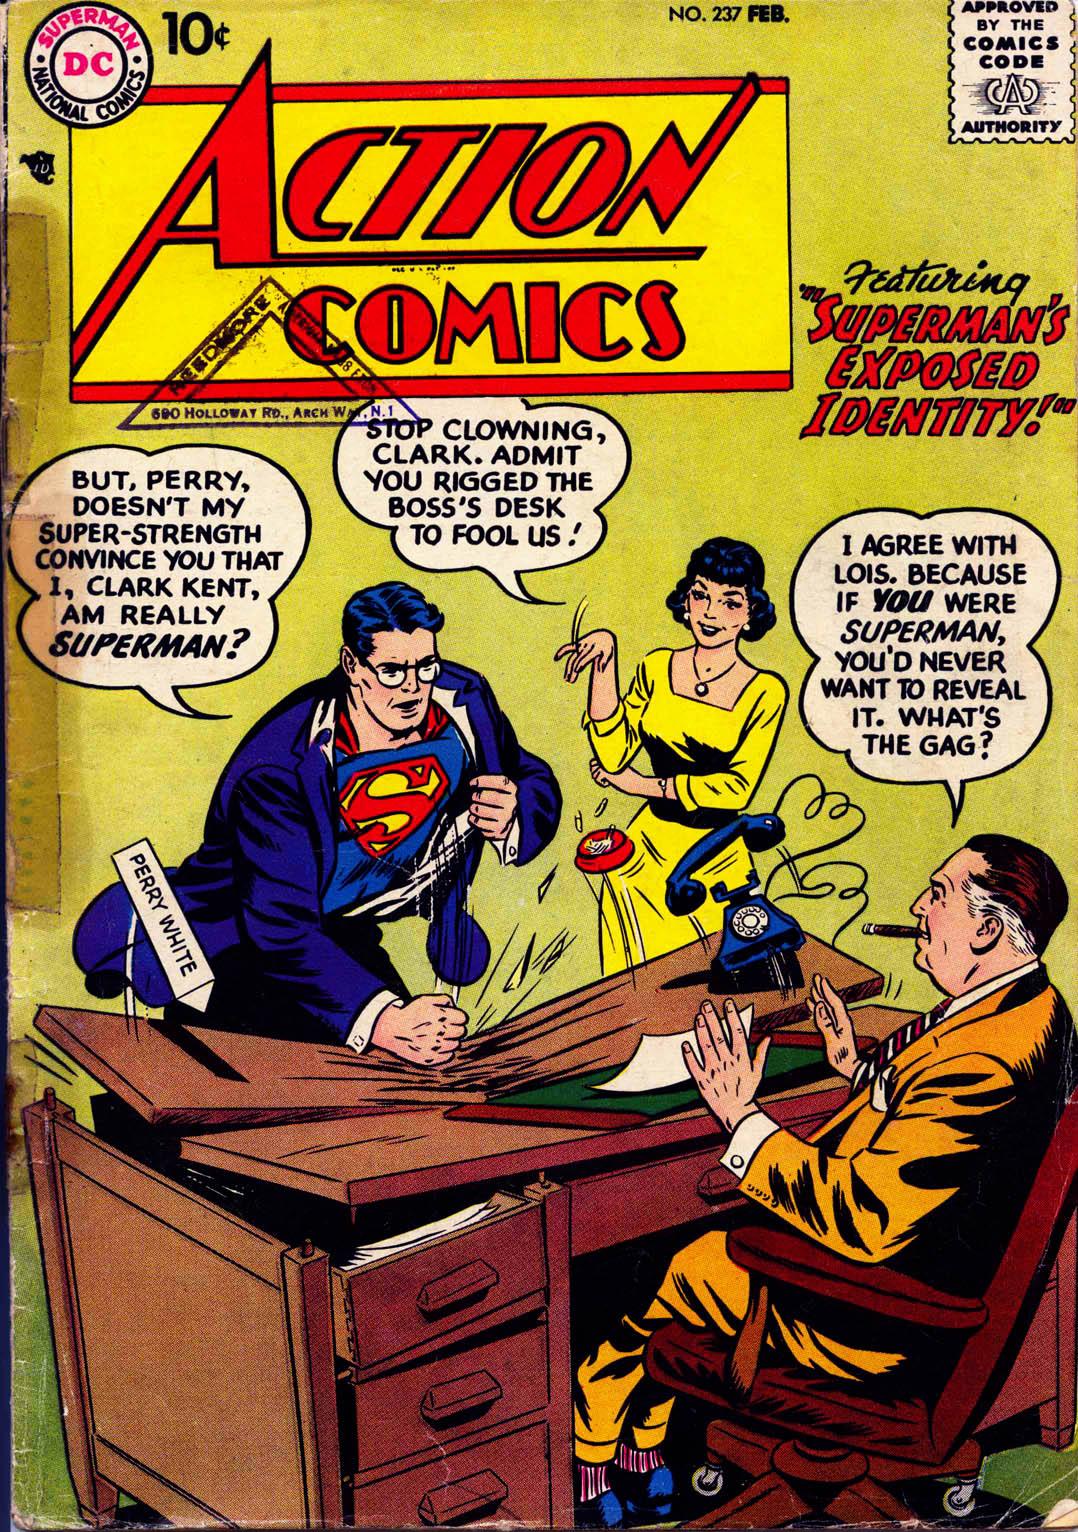 Action Comics (1938) 237 Page 1